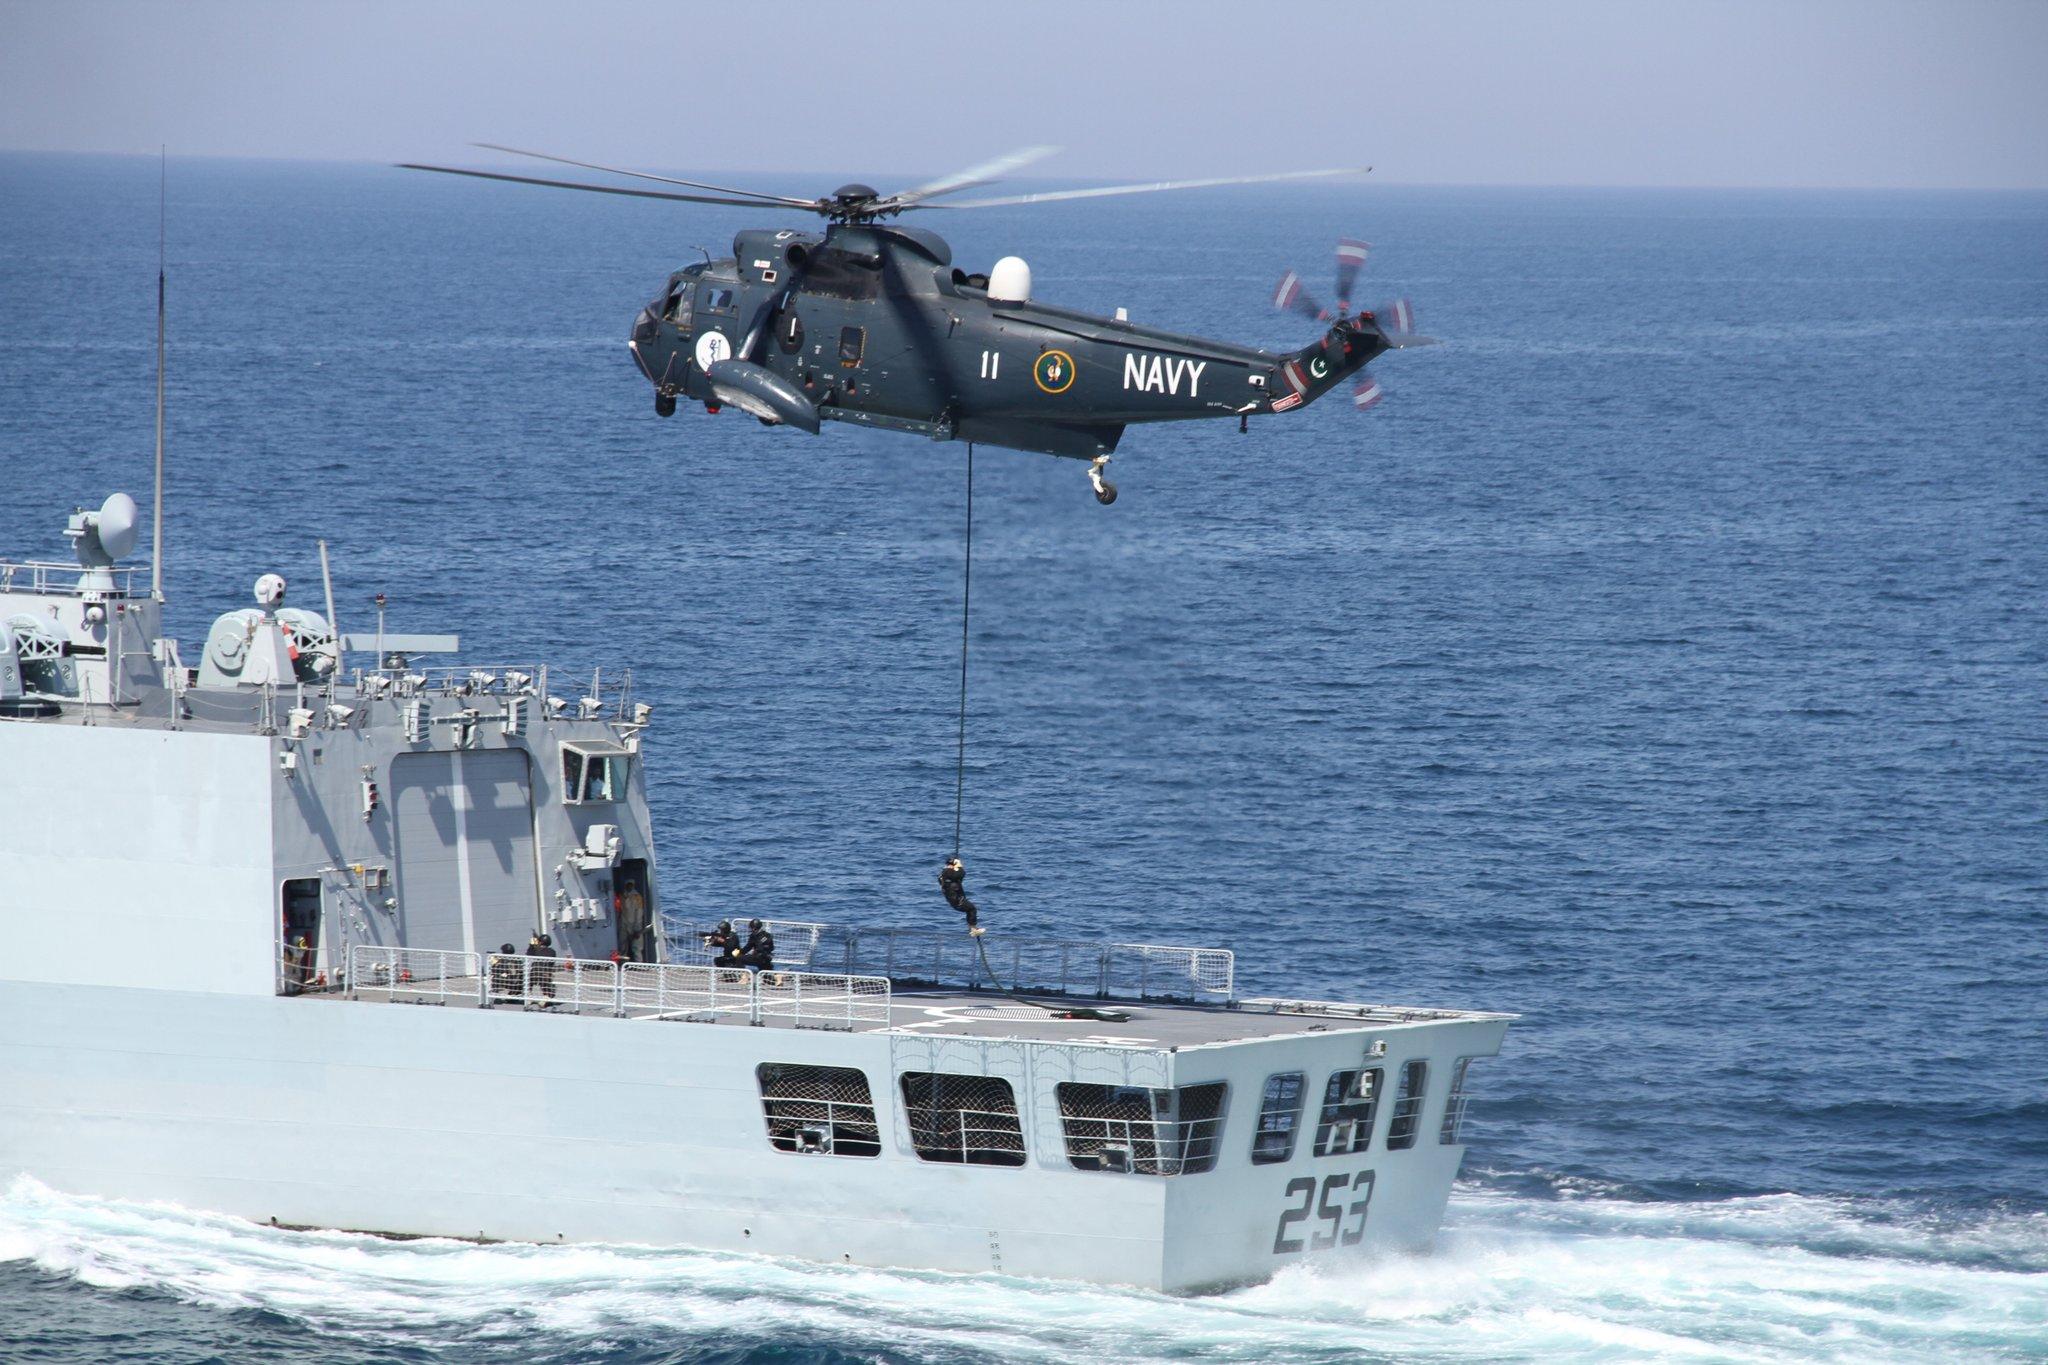 Pakistan's Naval Exercise Aman-21: More Rhetoric Less Substance